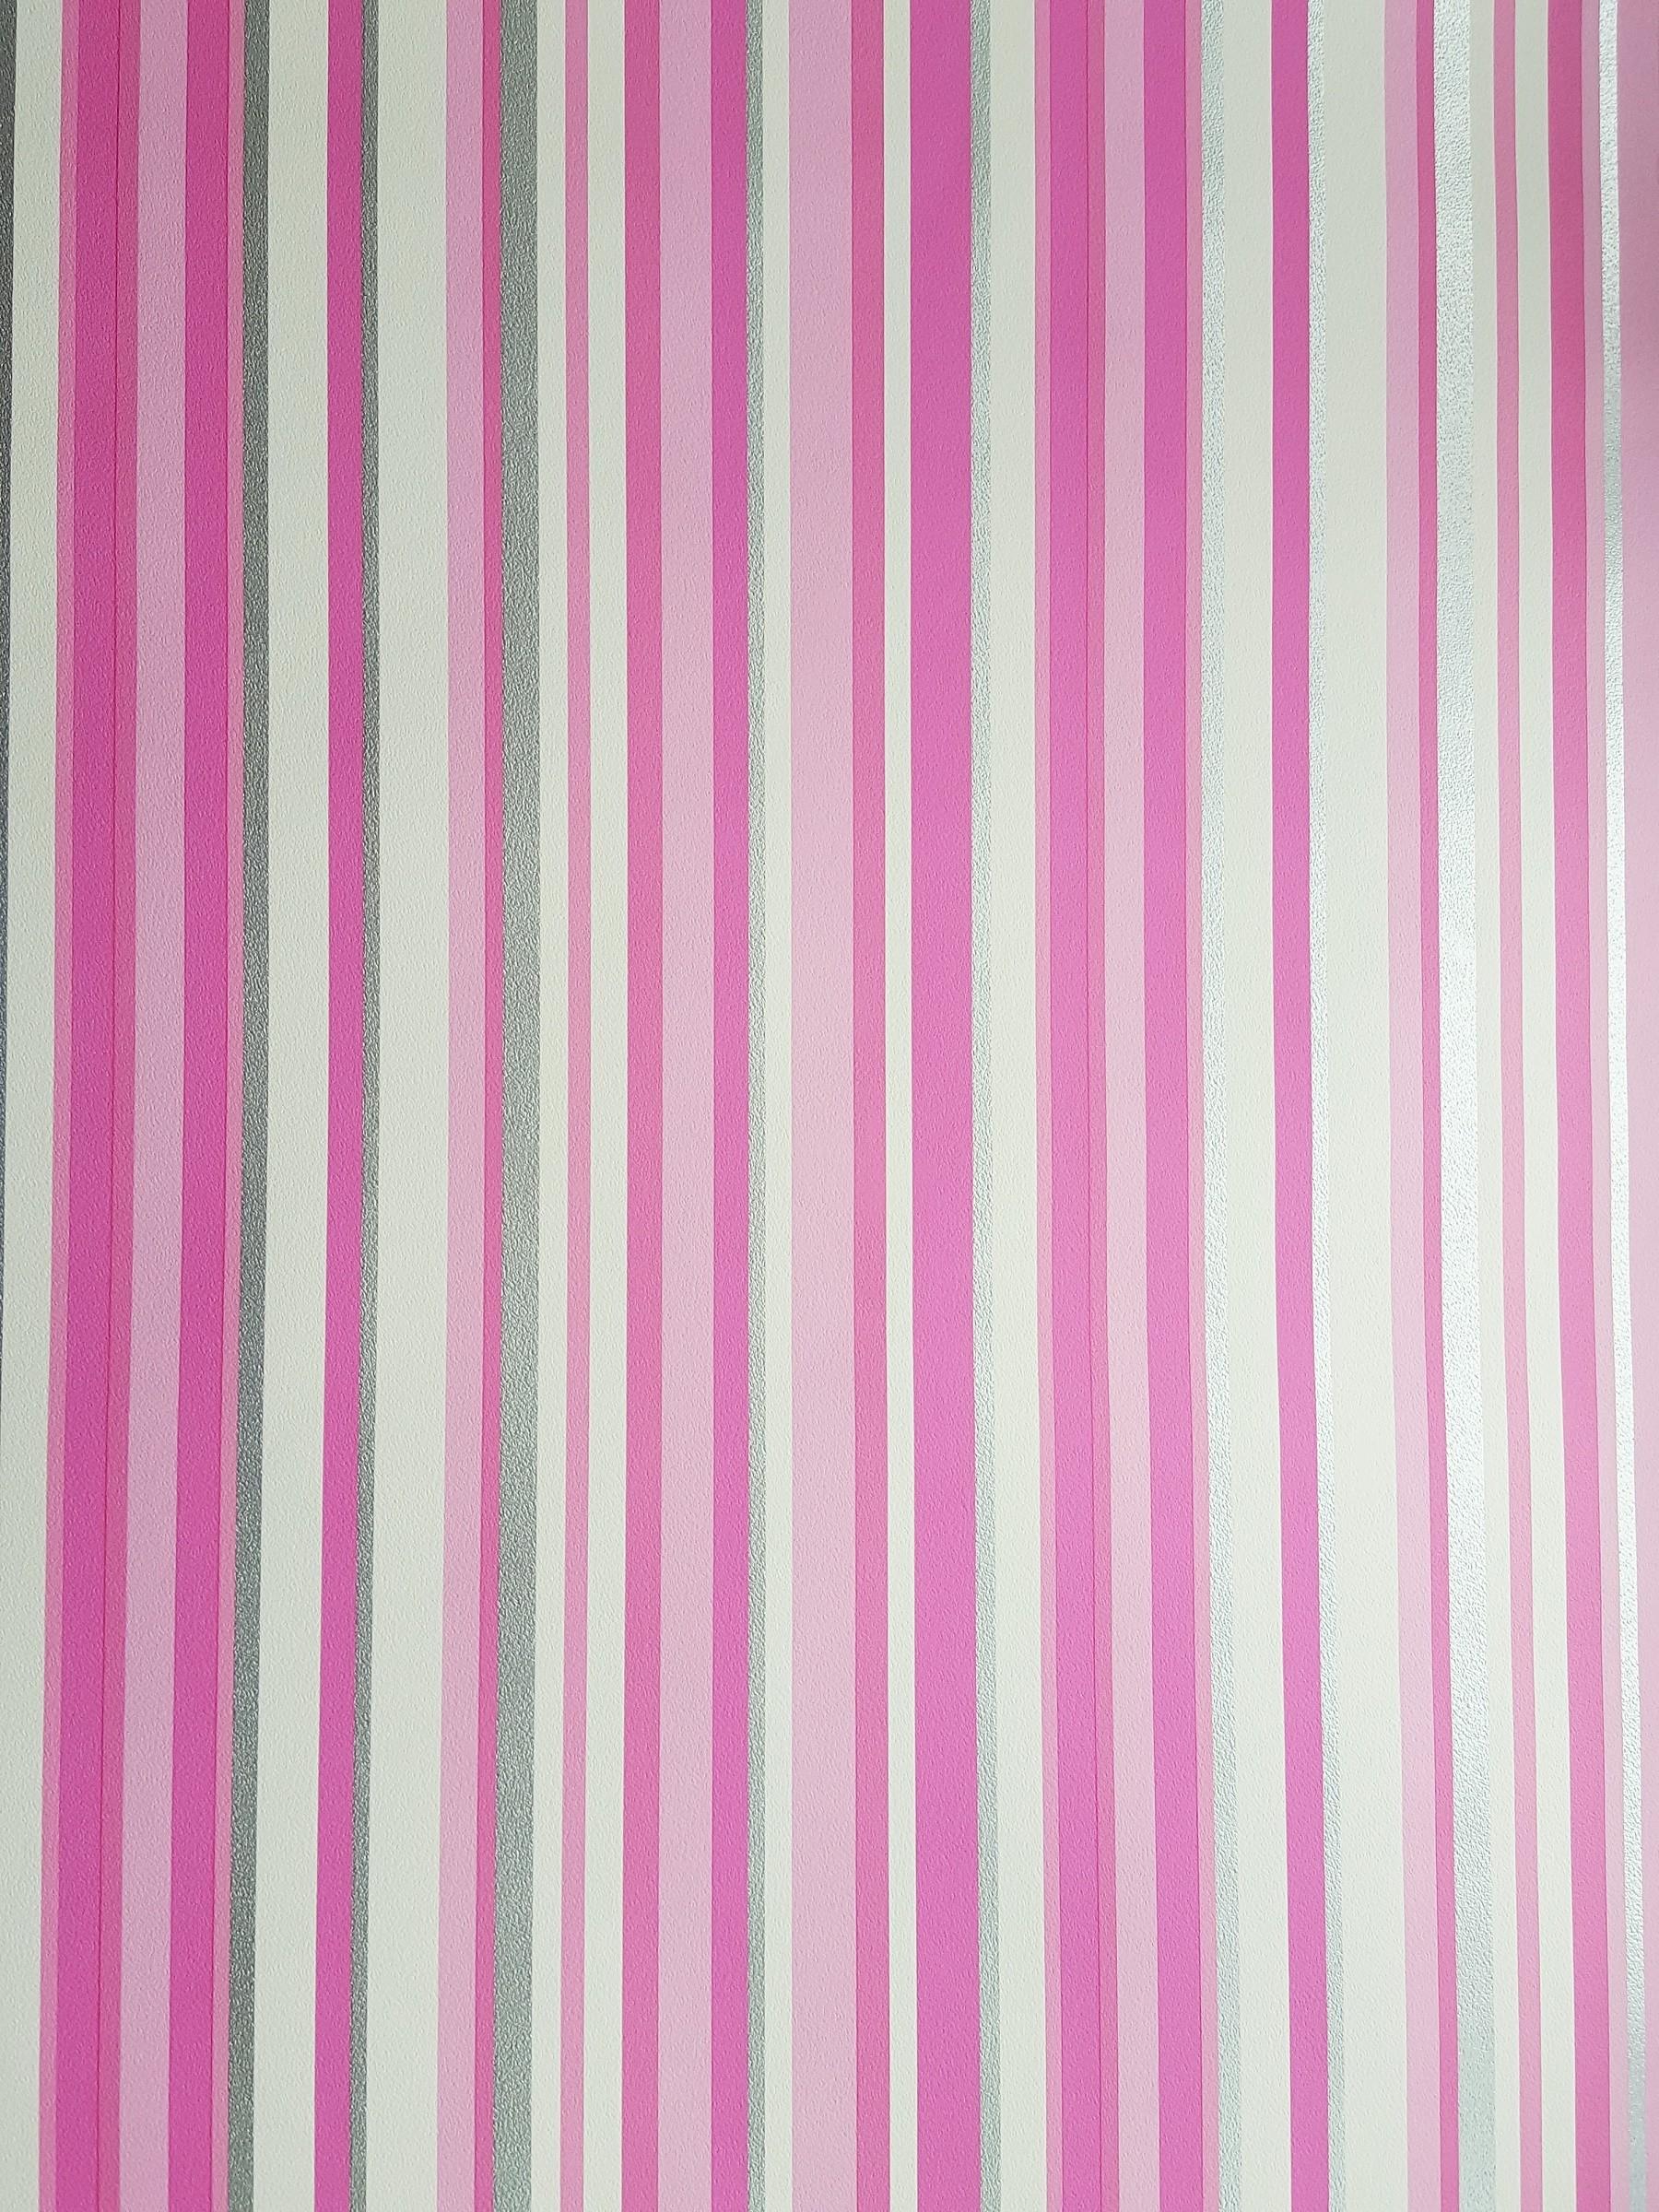 1920x1080 Wallpaper Polka Purple Hexagon Grey Dots Silver Medium C0c0c0 9370db Diagonal 30A